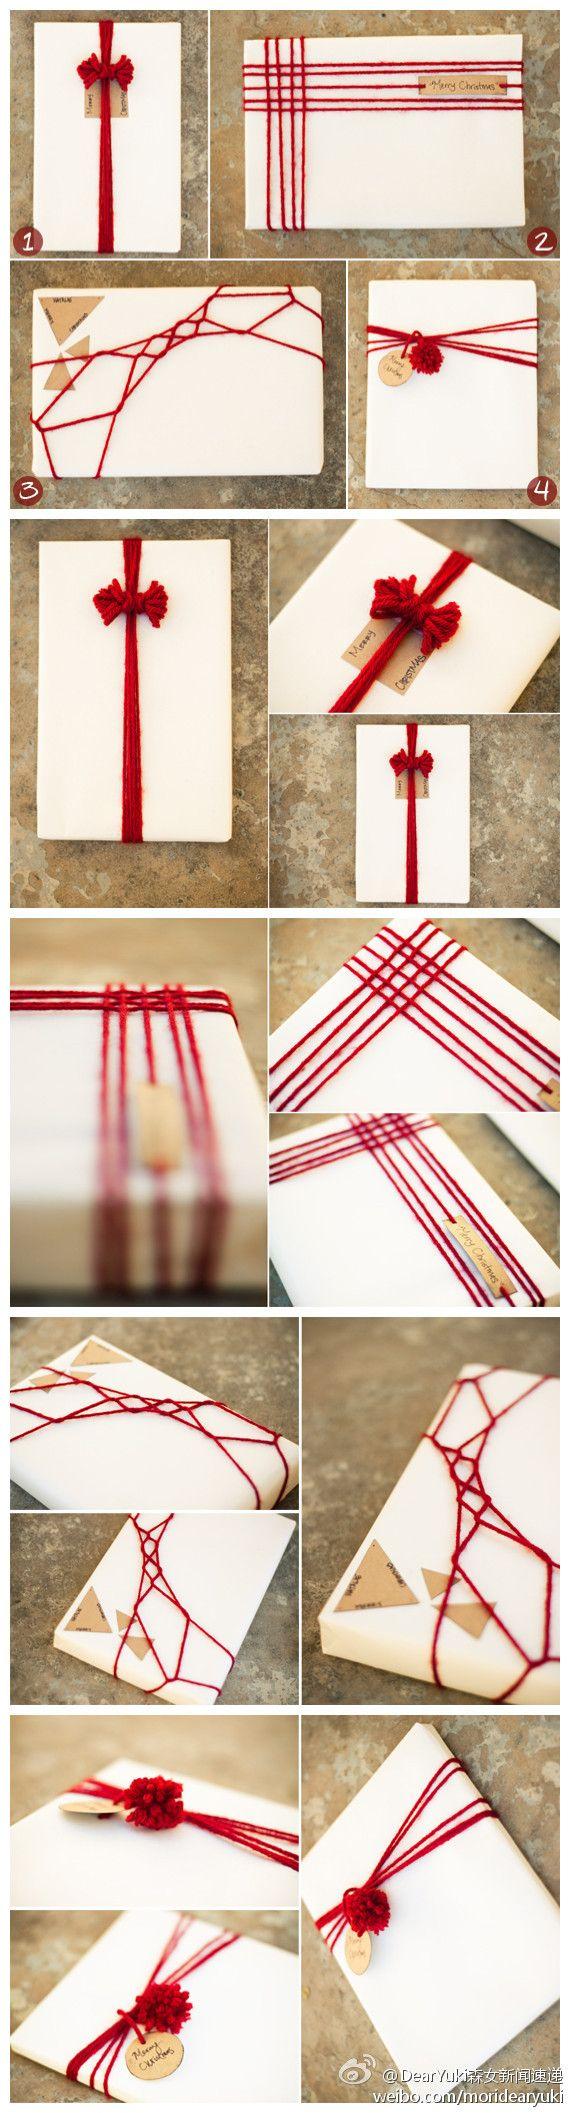 No instructions. No English. But interesting ideas for wrapping with string. 森女系圣诞节红毛线包装~_来自lammywu的图片分享-堆糖网